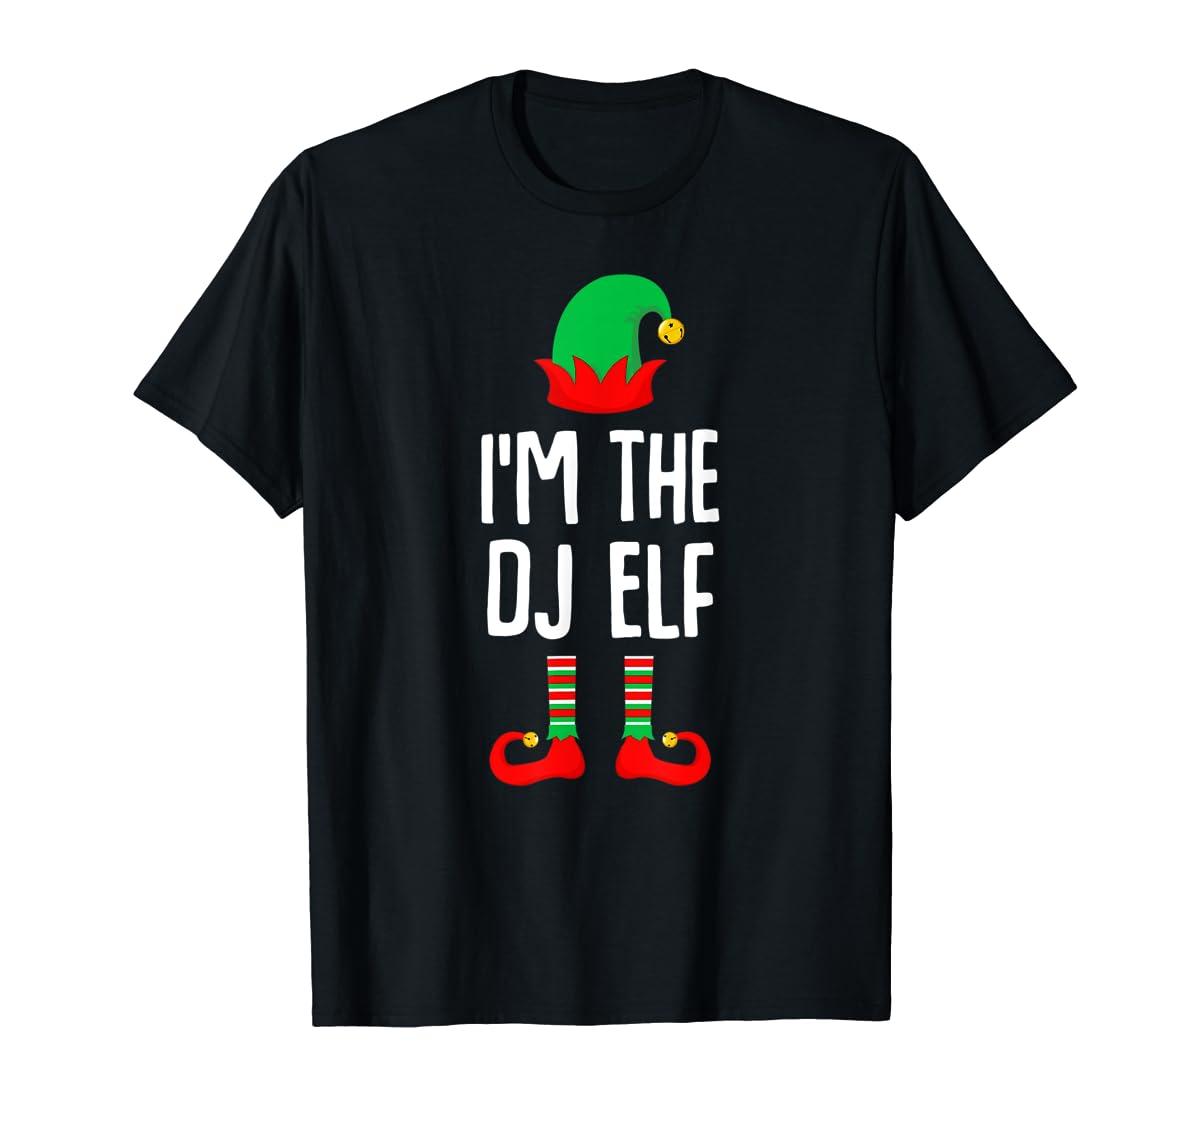 I'm The Dj Elf Matching Family Group Christmas T-Shirt-Men's T-Shirt-Black